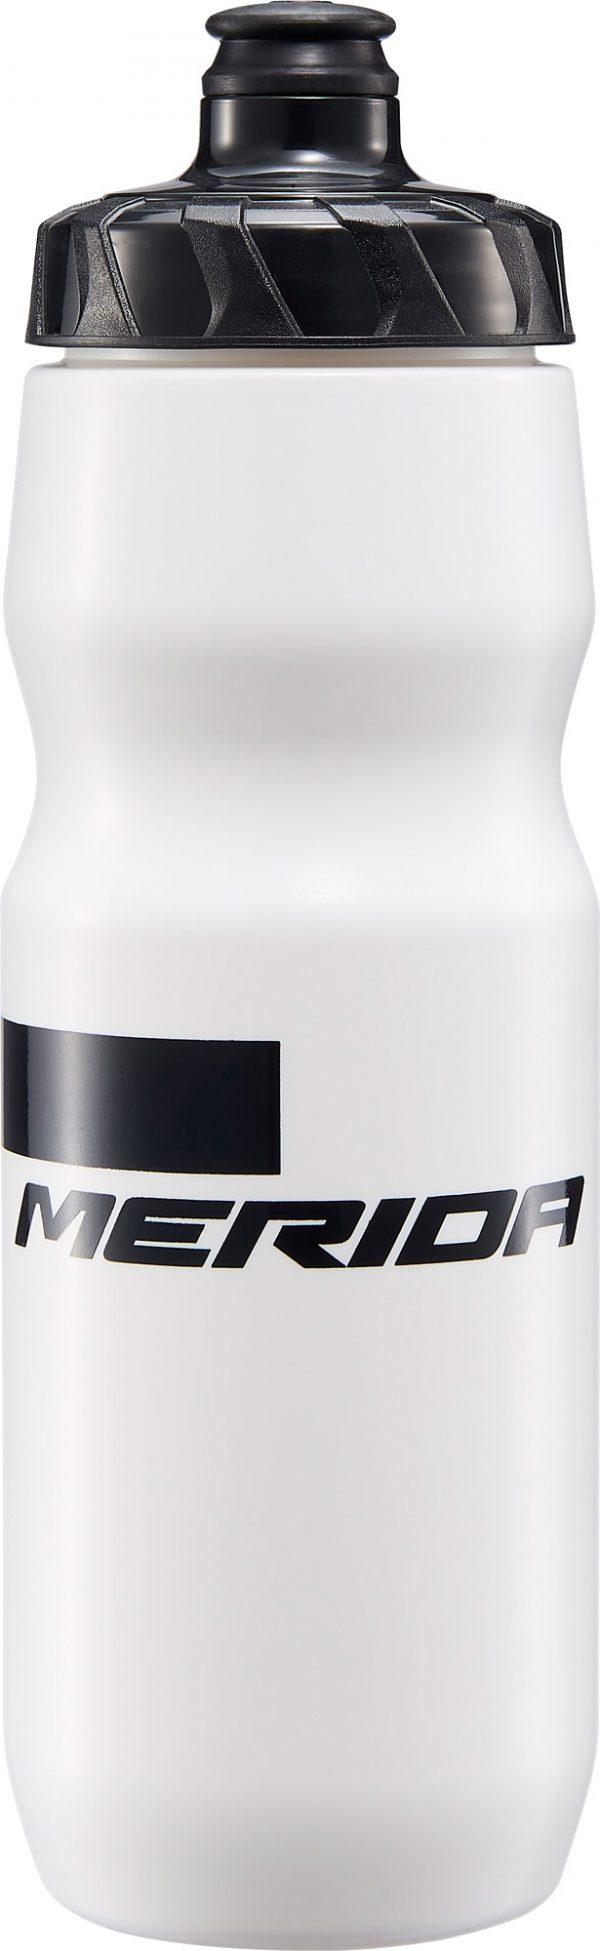 Фляга Merida Bottle/Stripe White, Black 800 мл